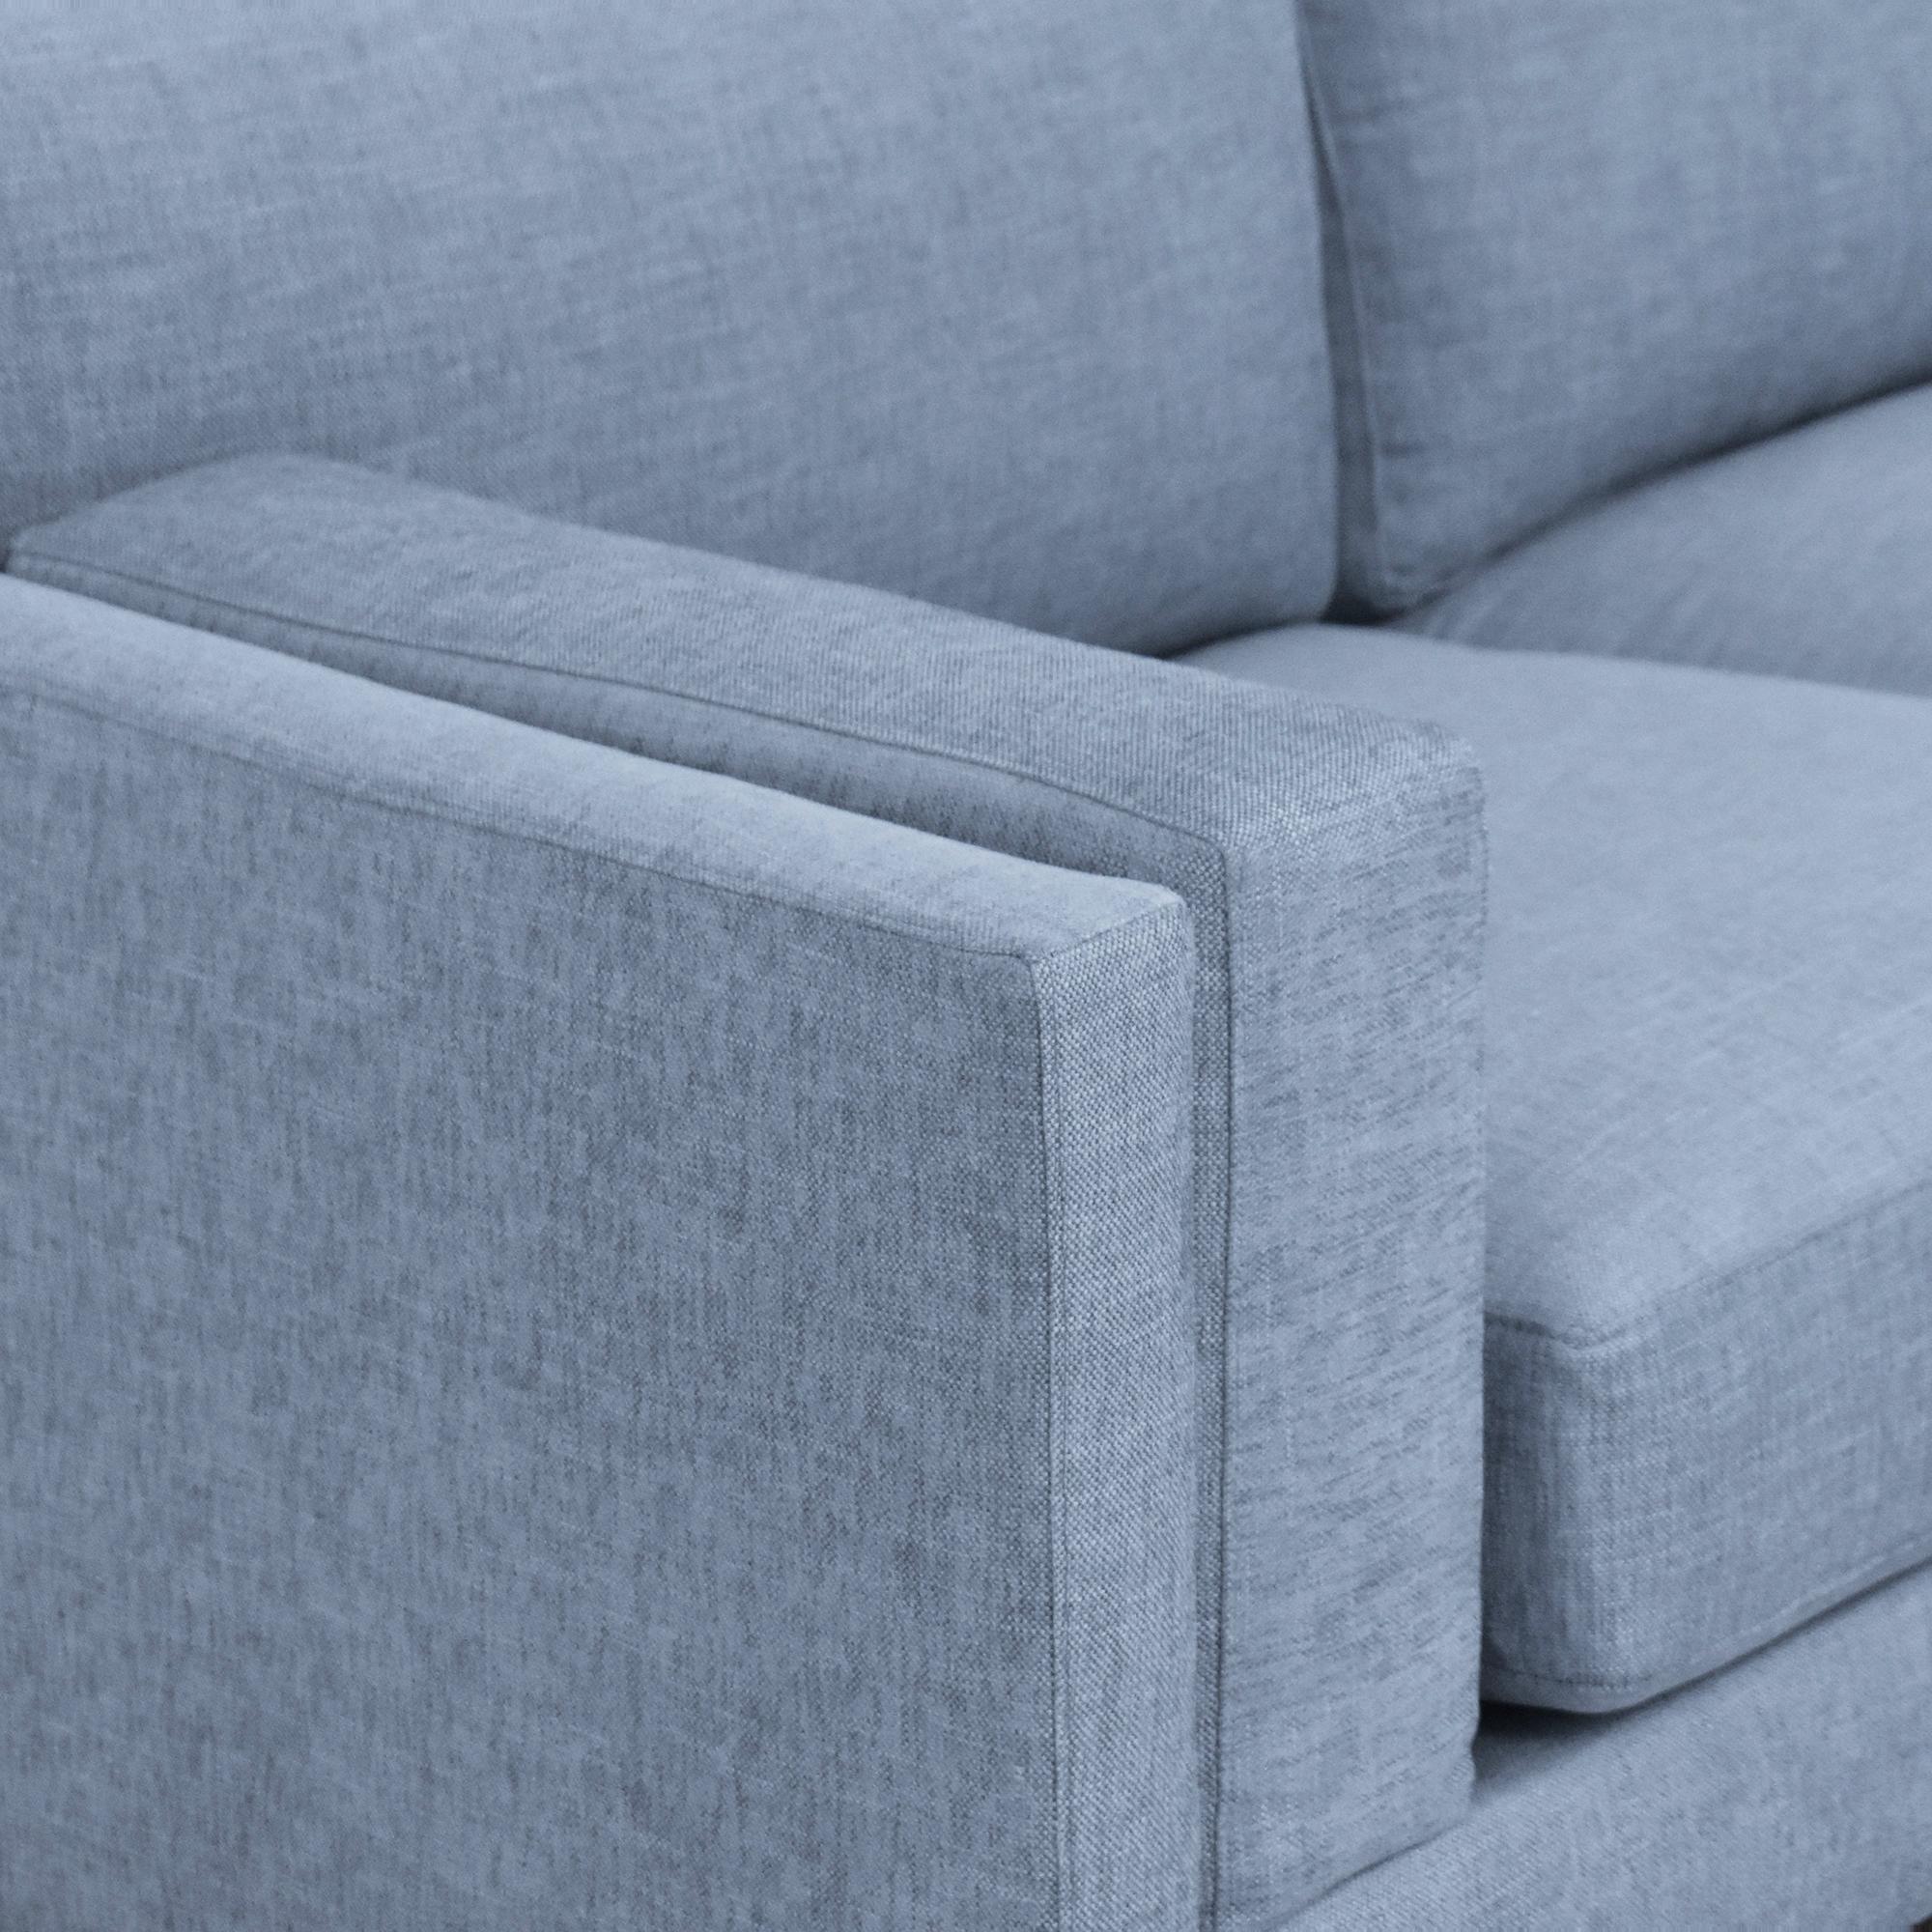 buy BenchMade Modern Skinny Fat Sofa with Ottoman BenchMade Modern